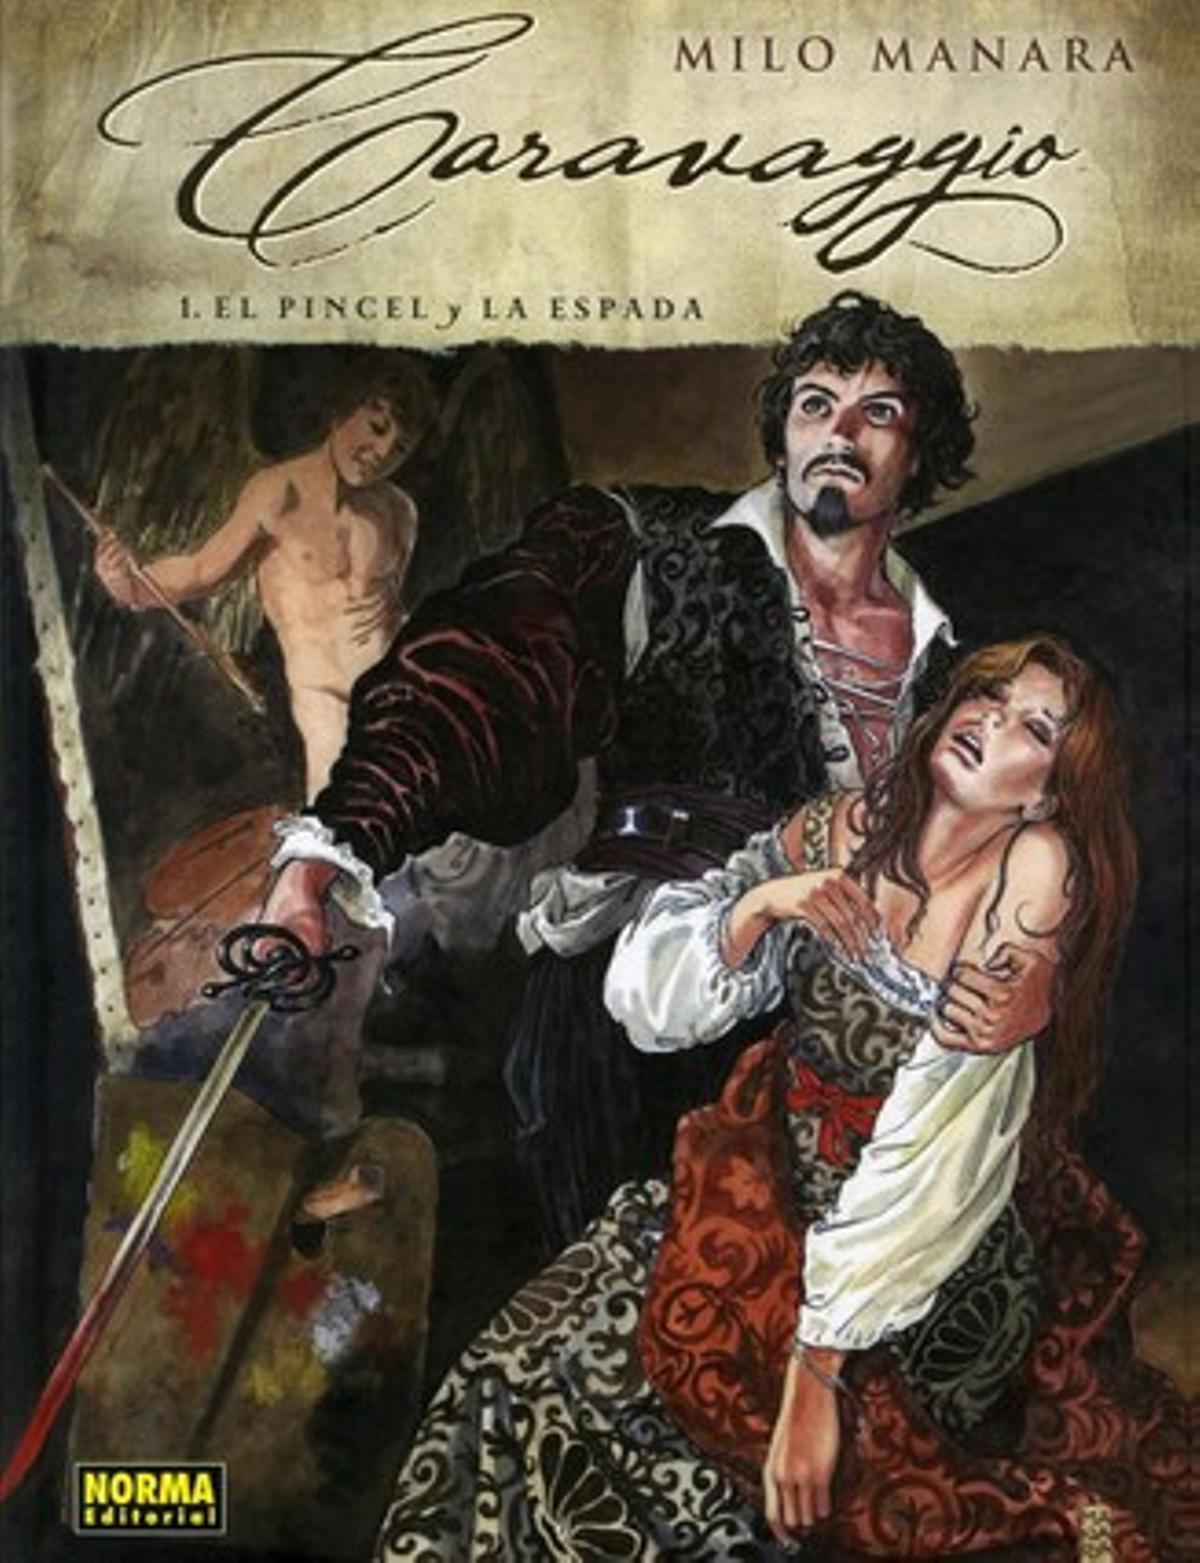 Portada de 'Caravaggio', de Milo Manara.